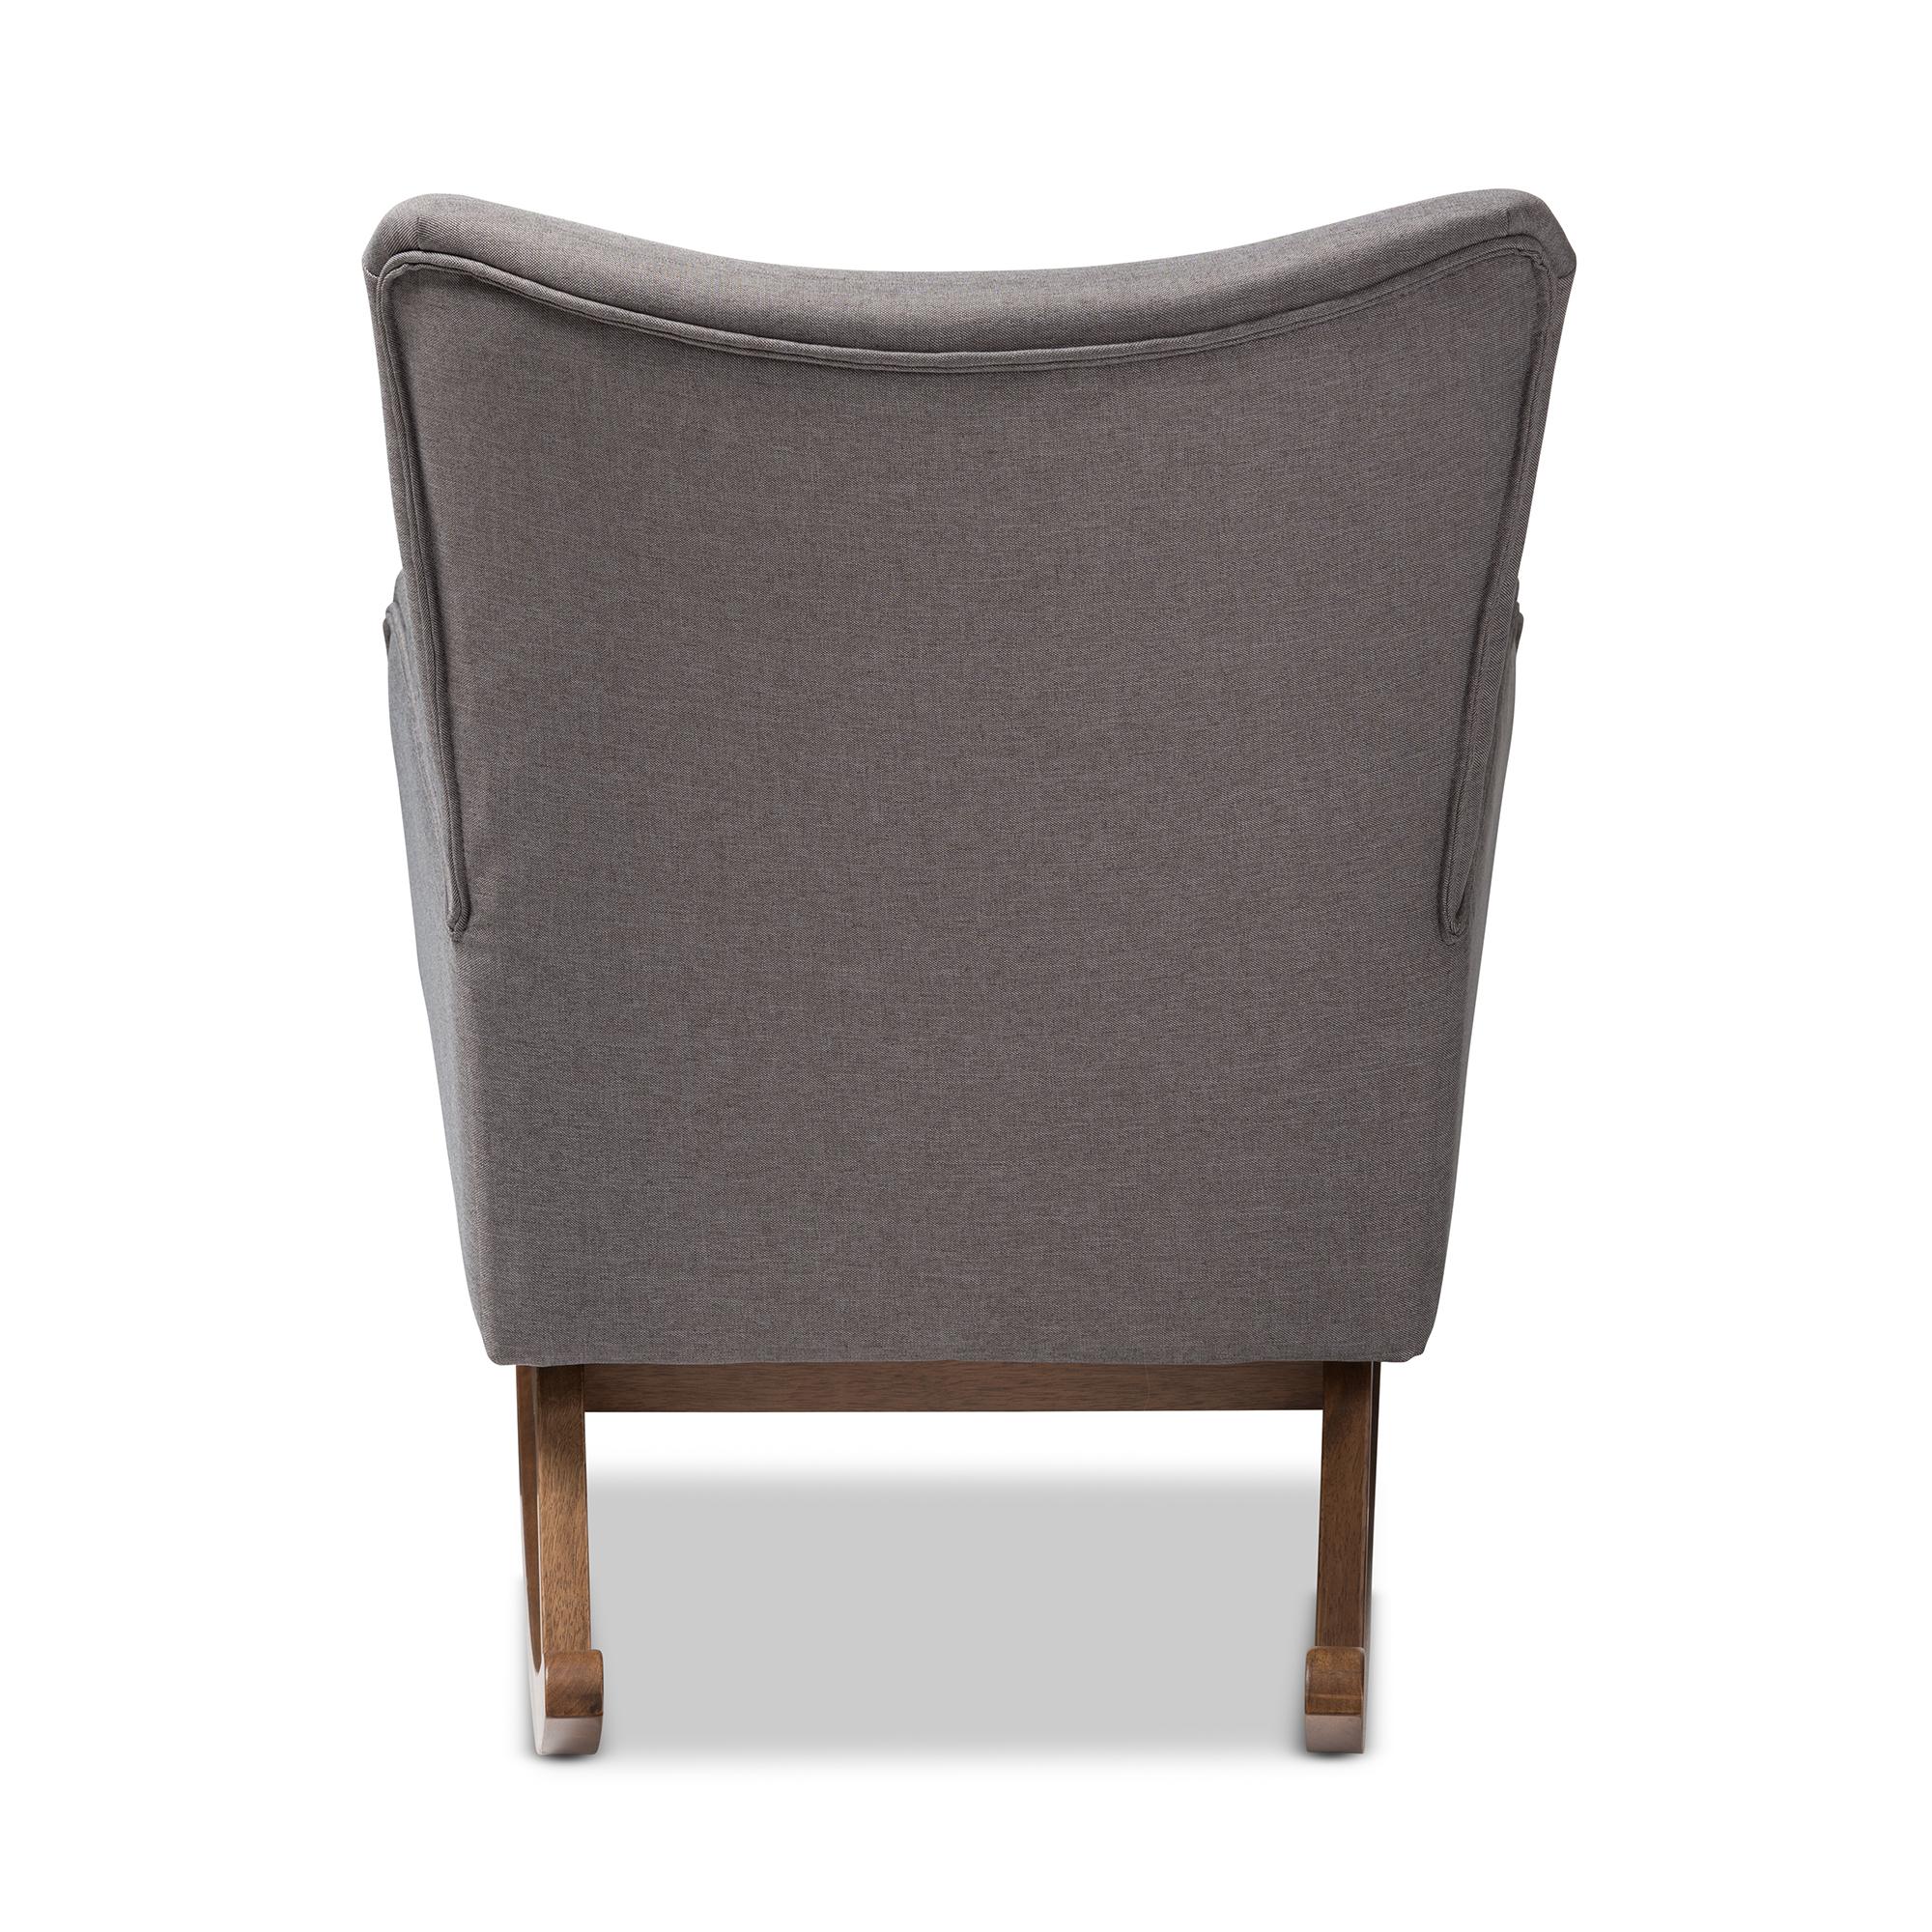 ... Baxton Studio Waldmann Mid Century Modern Grey Fabric Upholstered  Rocking Chair   IEBBT5303 Grey ...